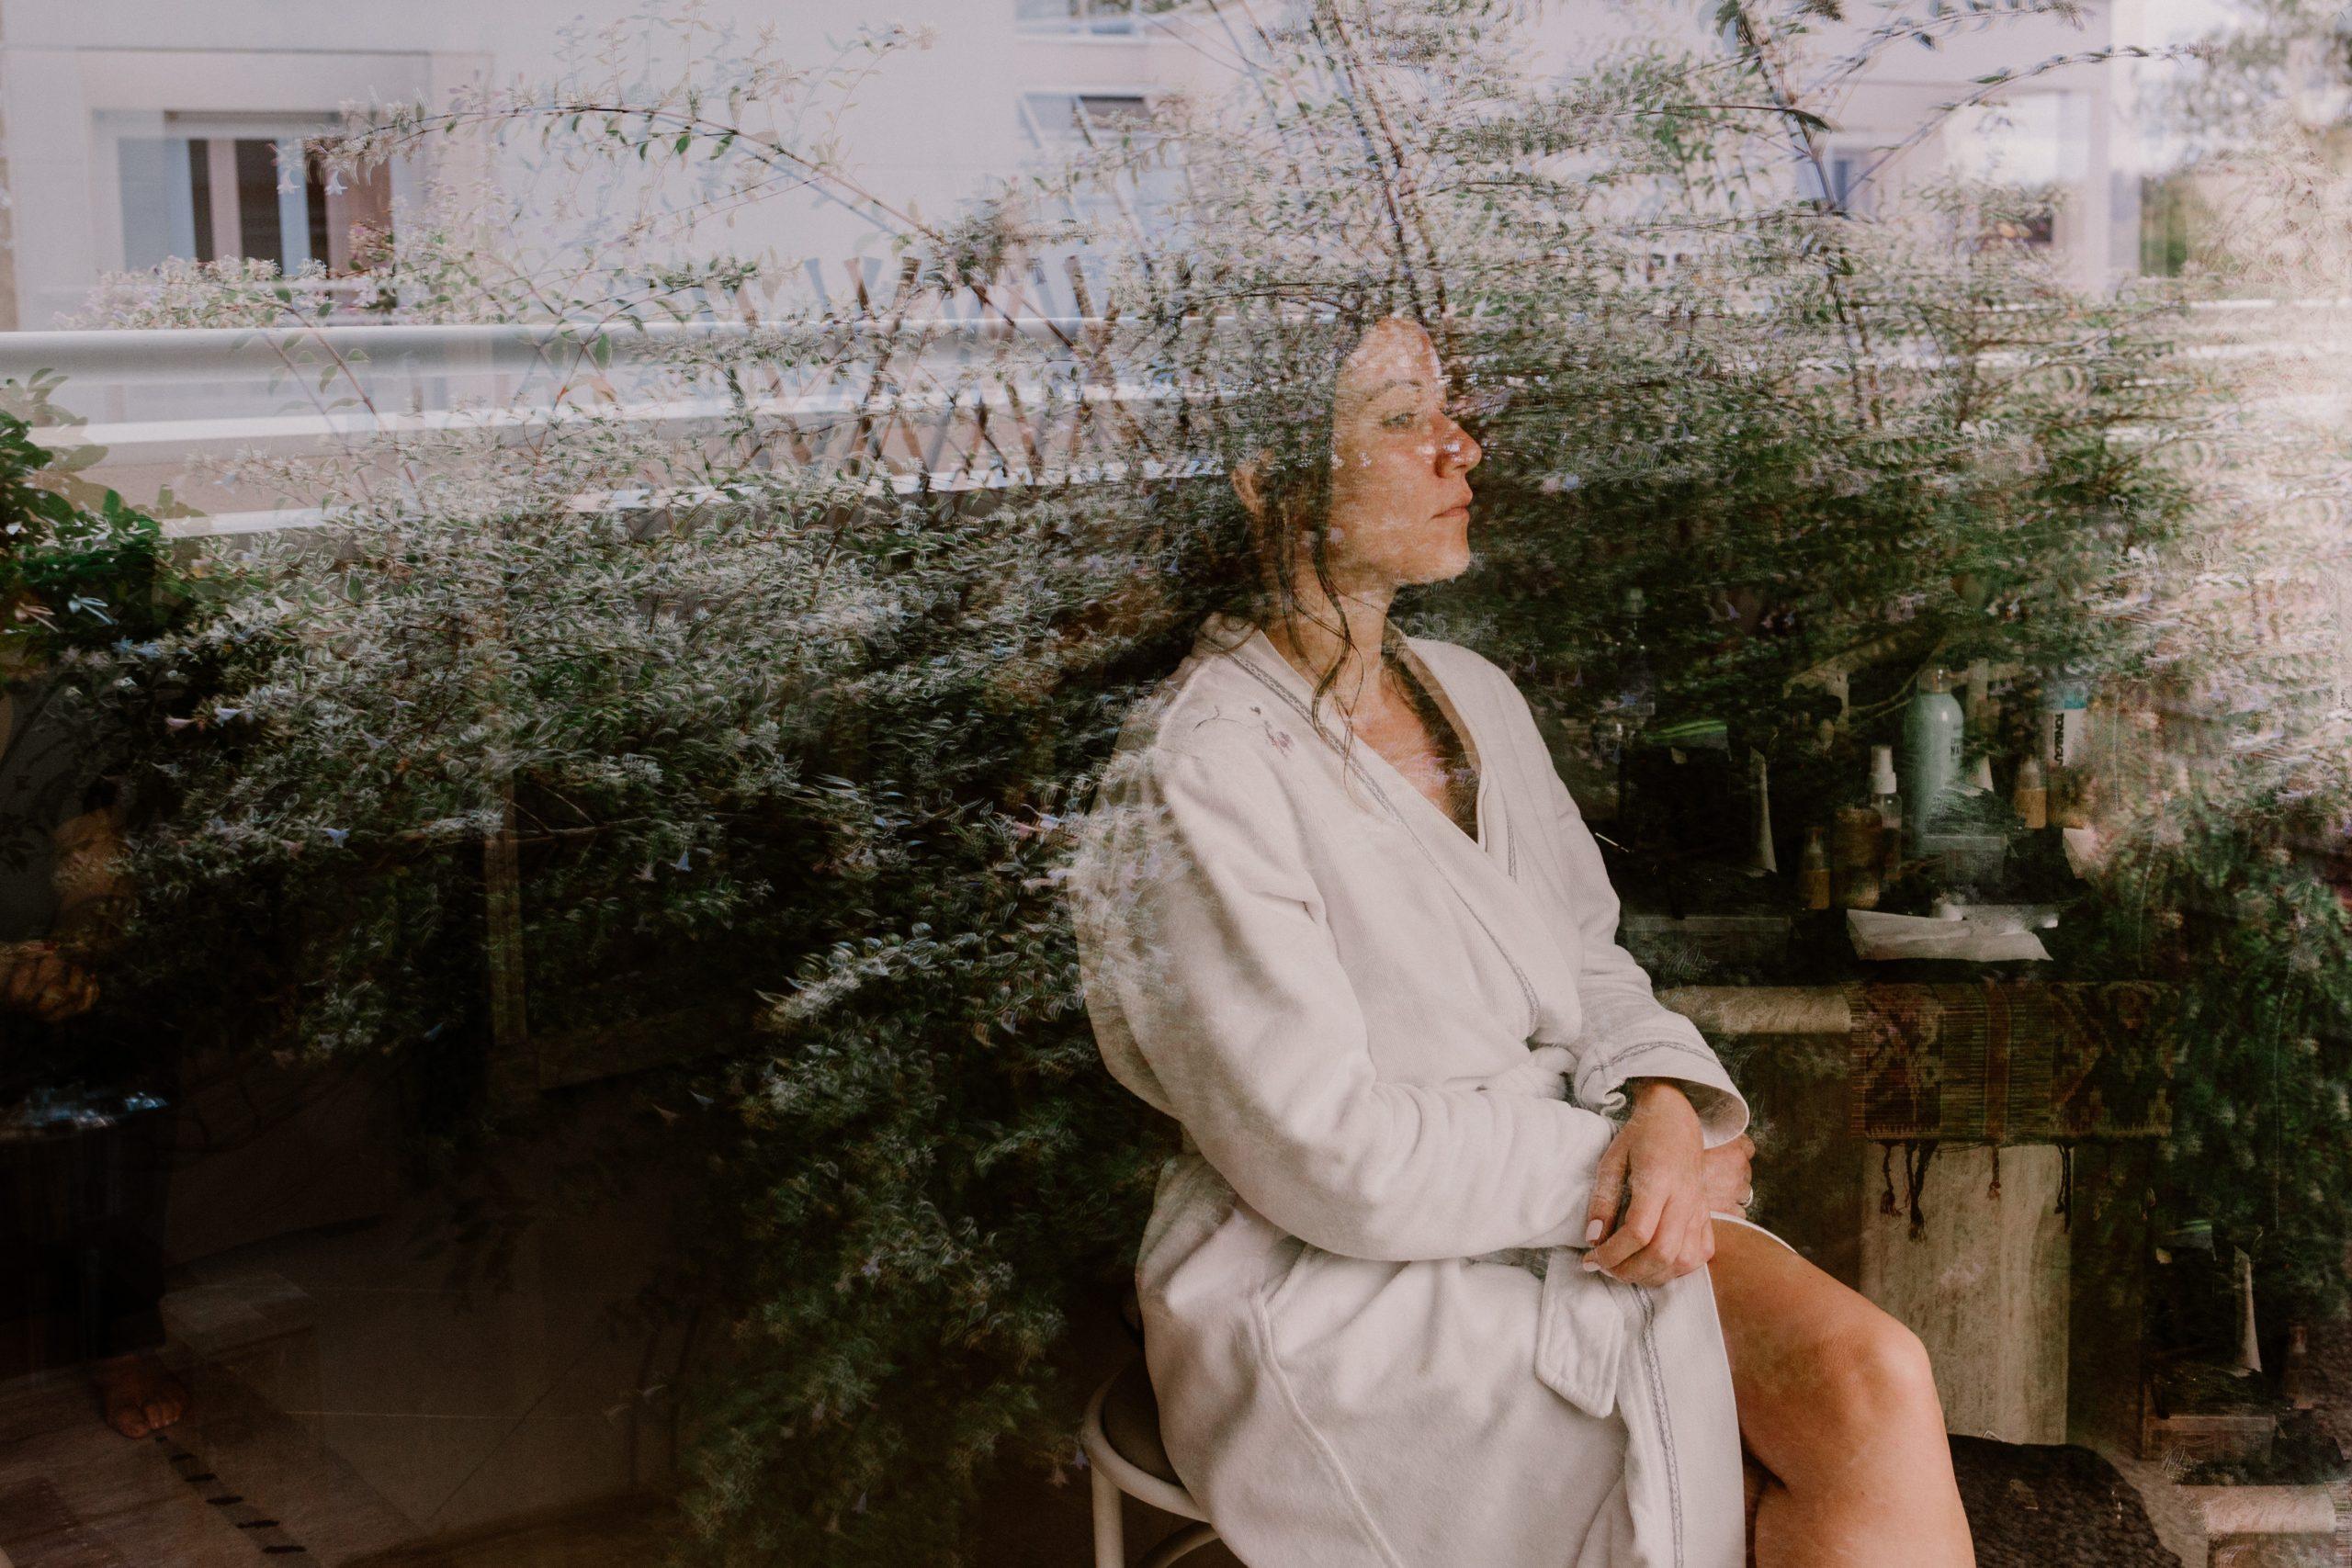 HD Mariage Aurelie Eric 1 scaled - Dagmara Bojenko - Eco-conscious Weddings, Births & Families